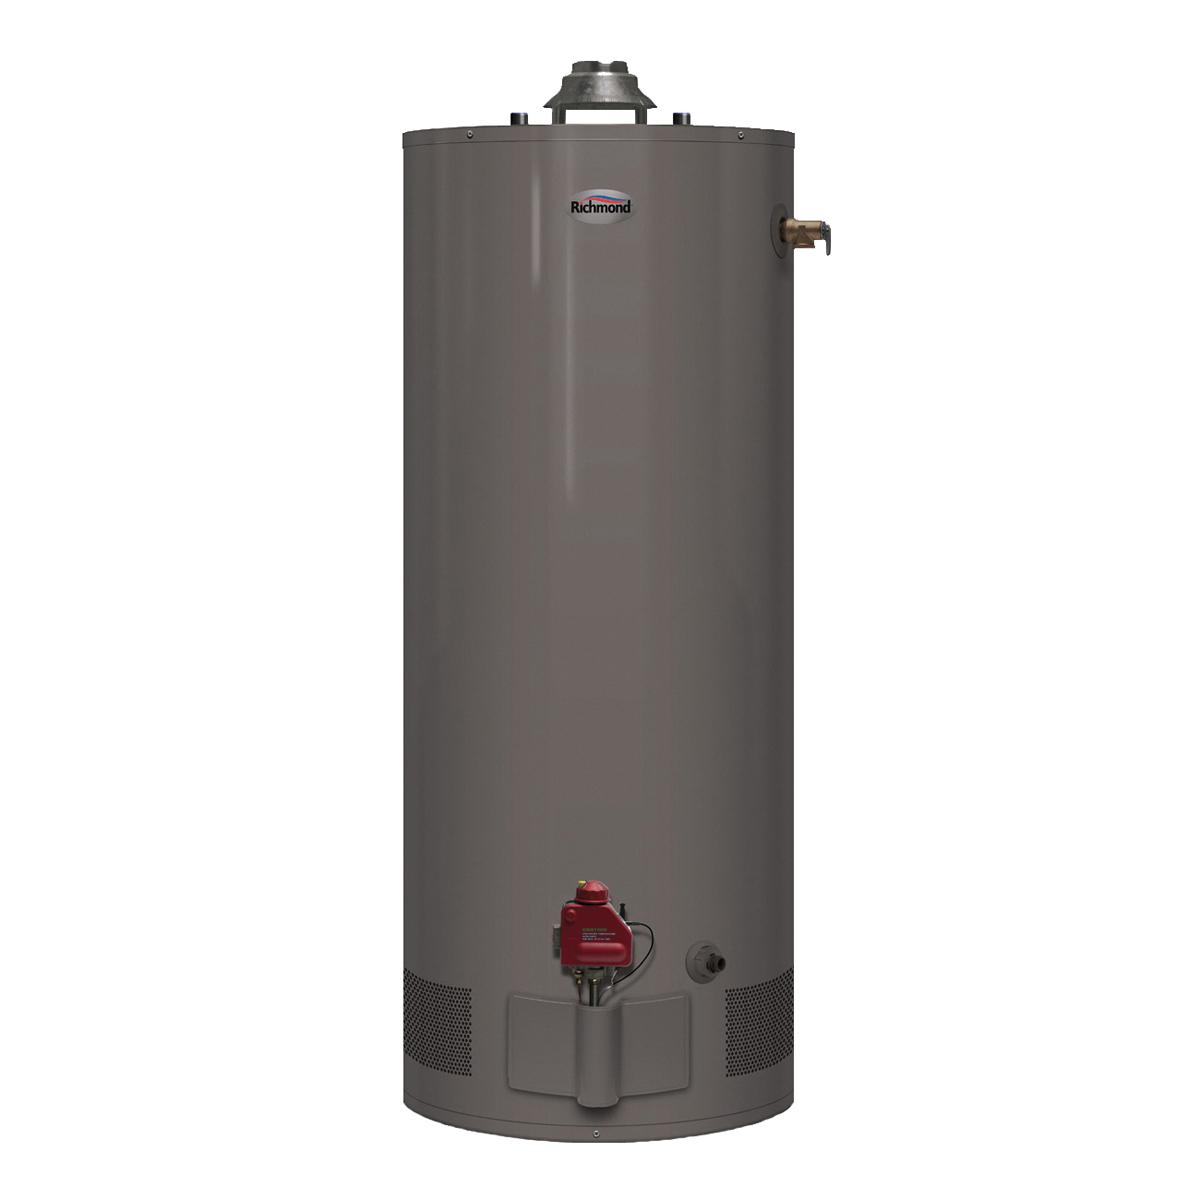 Picture of Richmond Essential 6G40S-31PF3 Gas Water Heater, Liquid Propane, 40 gal Tank, 65 gph, 31000 Btu/hr BTU